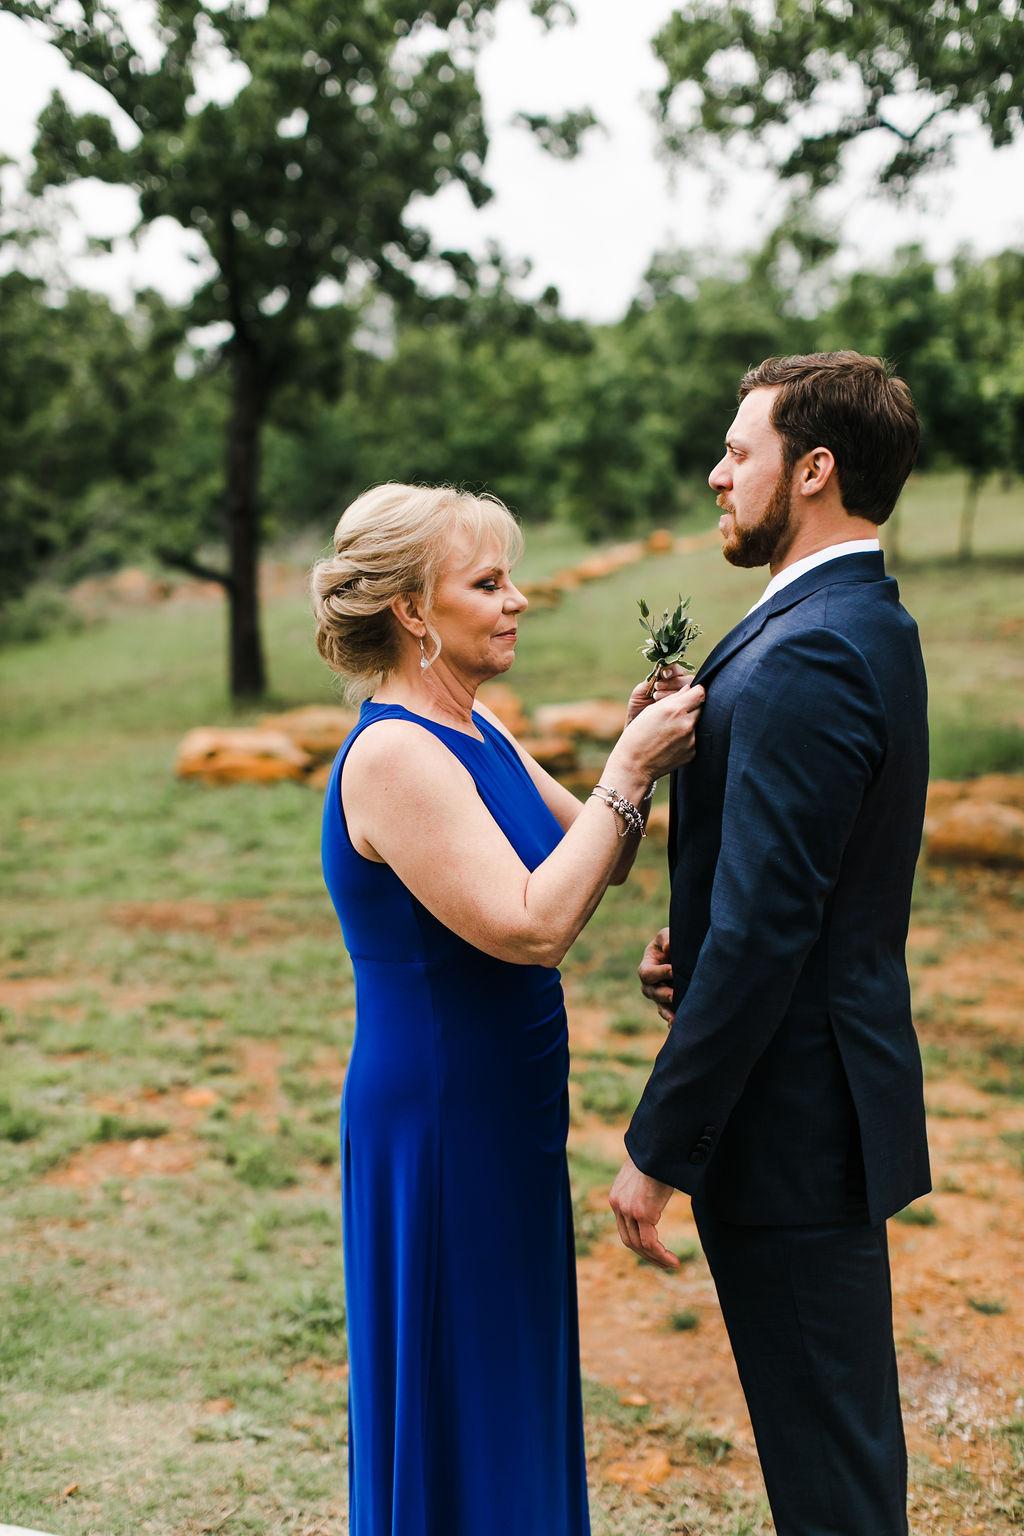 Dream Point Ranch Tulsa's White Barn Wedding Venue 15.jpg